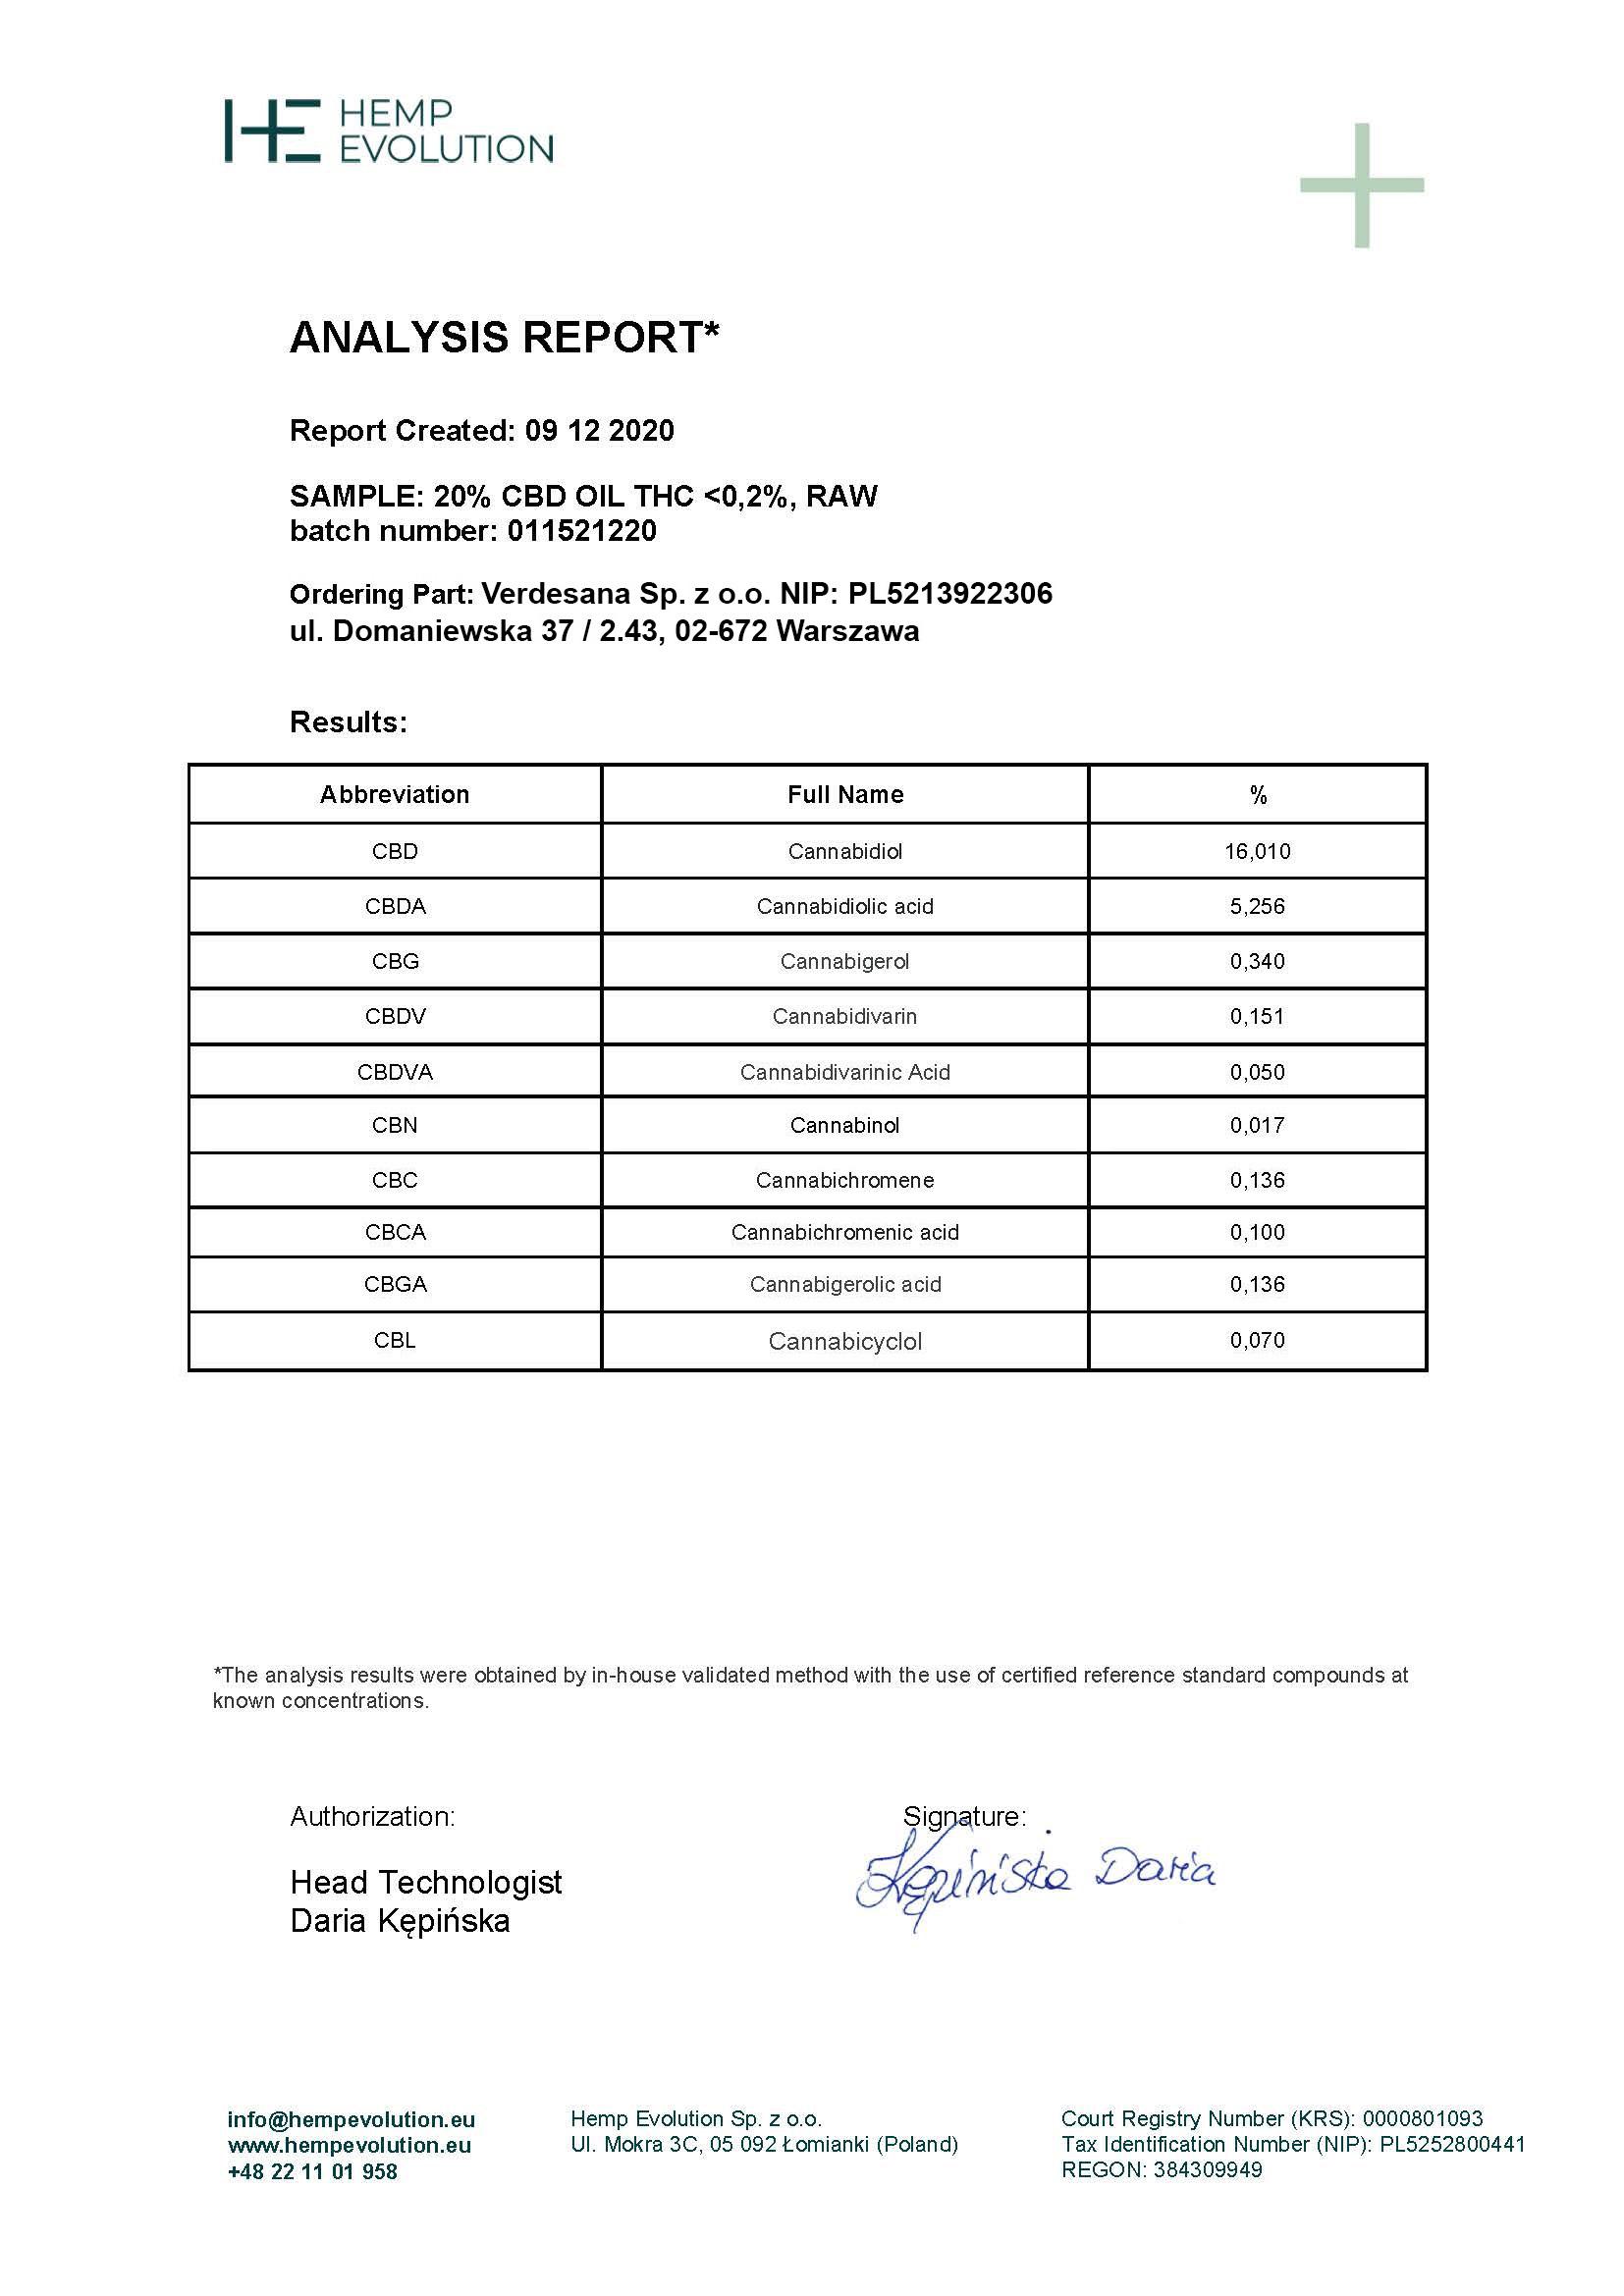 Certyfikat analizy - Verdesana Ekstrakt Konopny 20% CBD THC pon 02% RAW